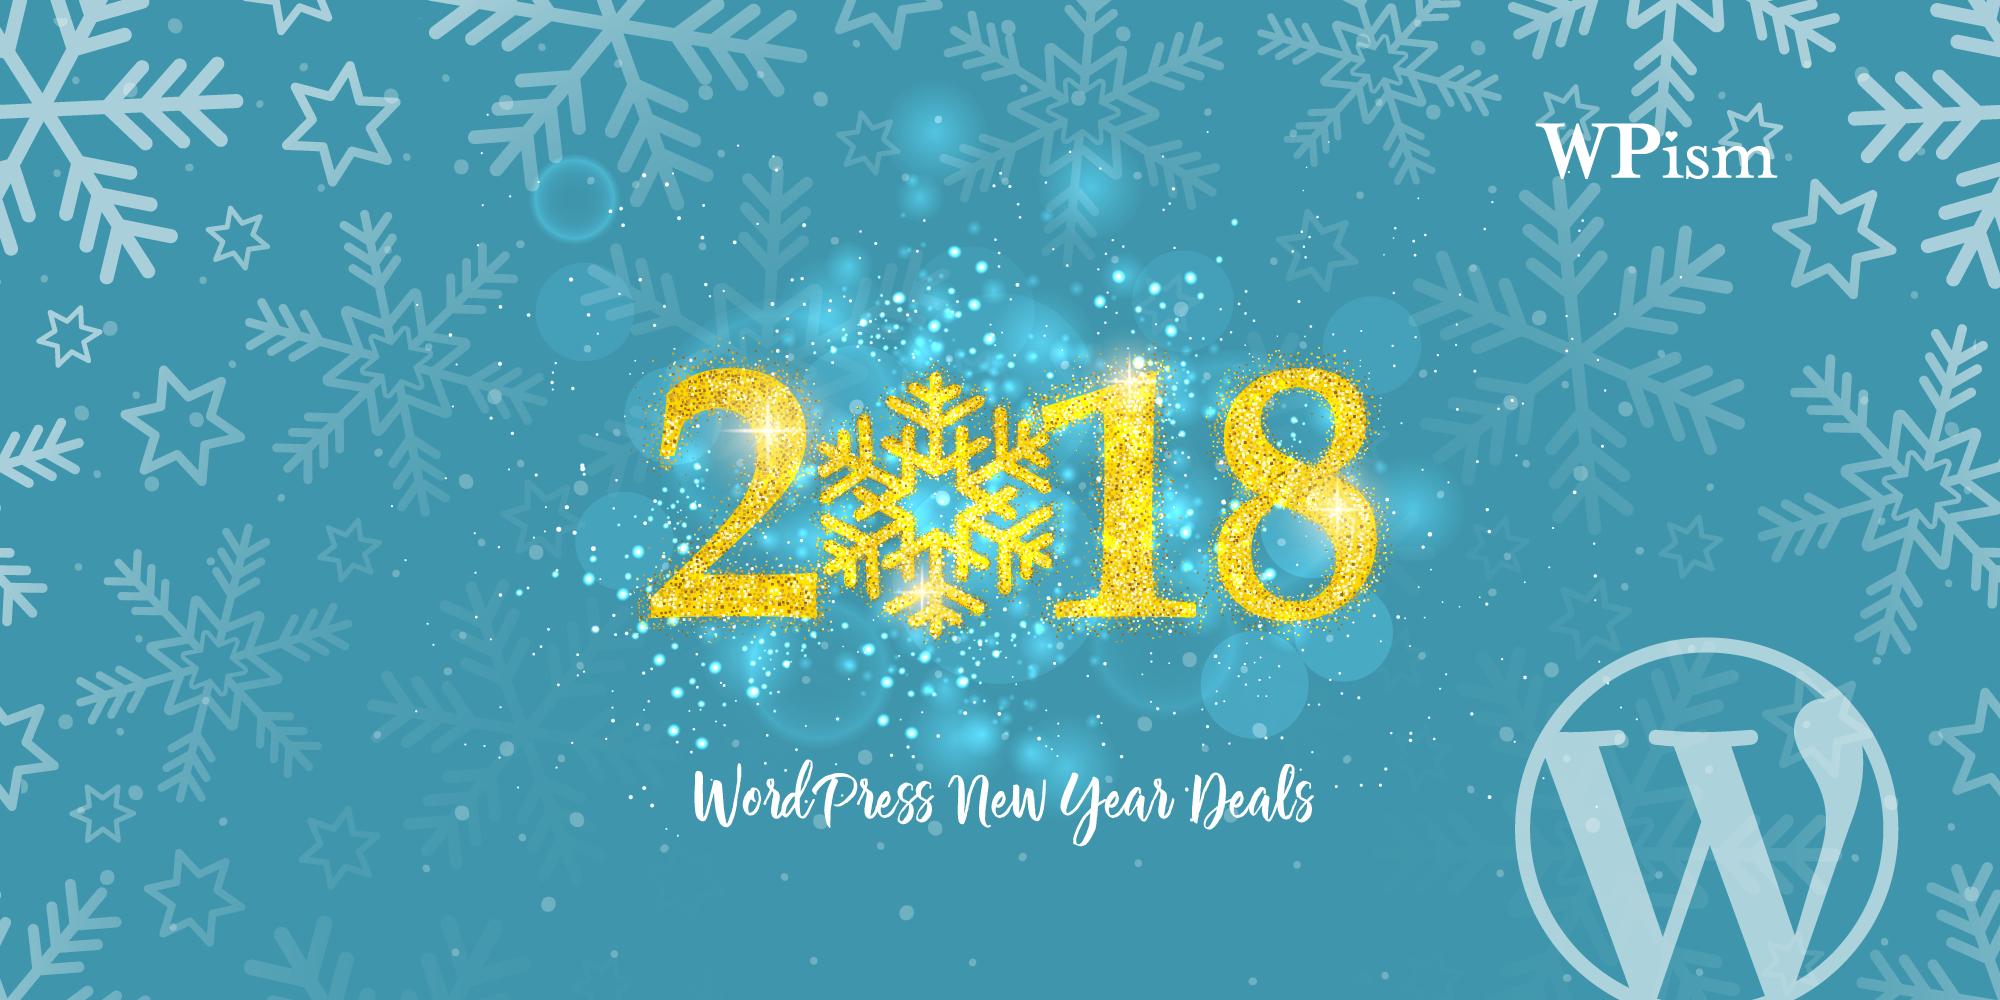 WordPress Christmas New Year Deals 2018